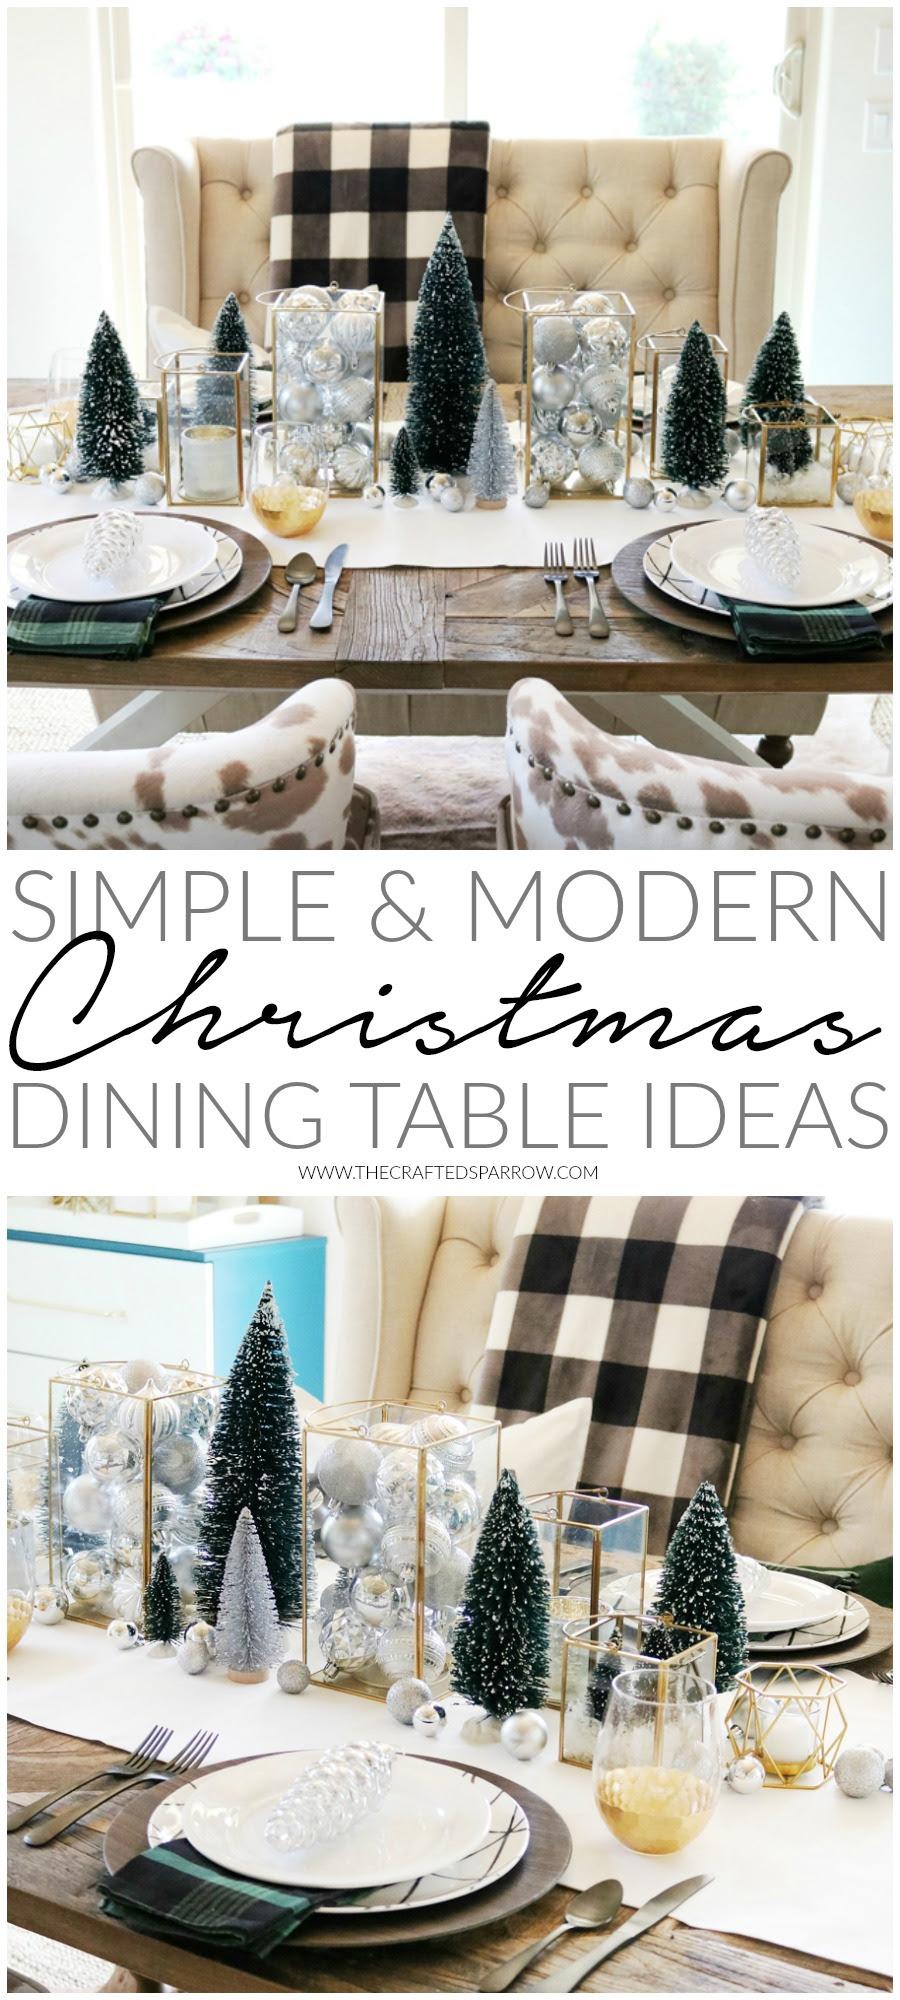 Simple & Modern Christmas Dining Table Ideas